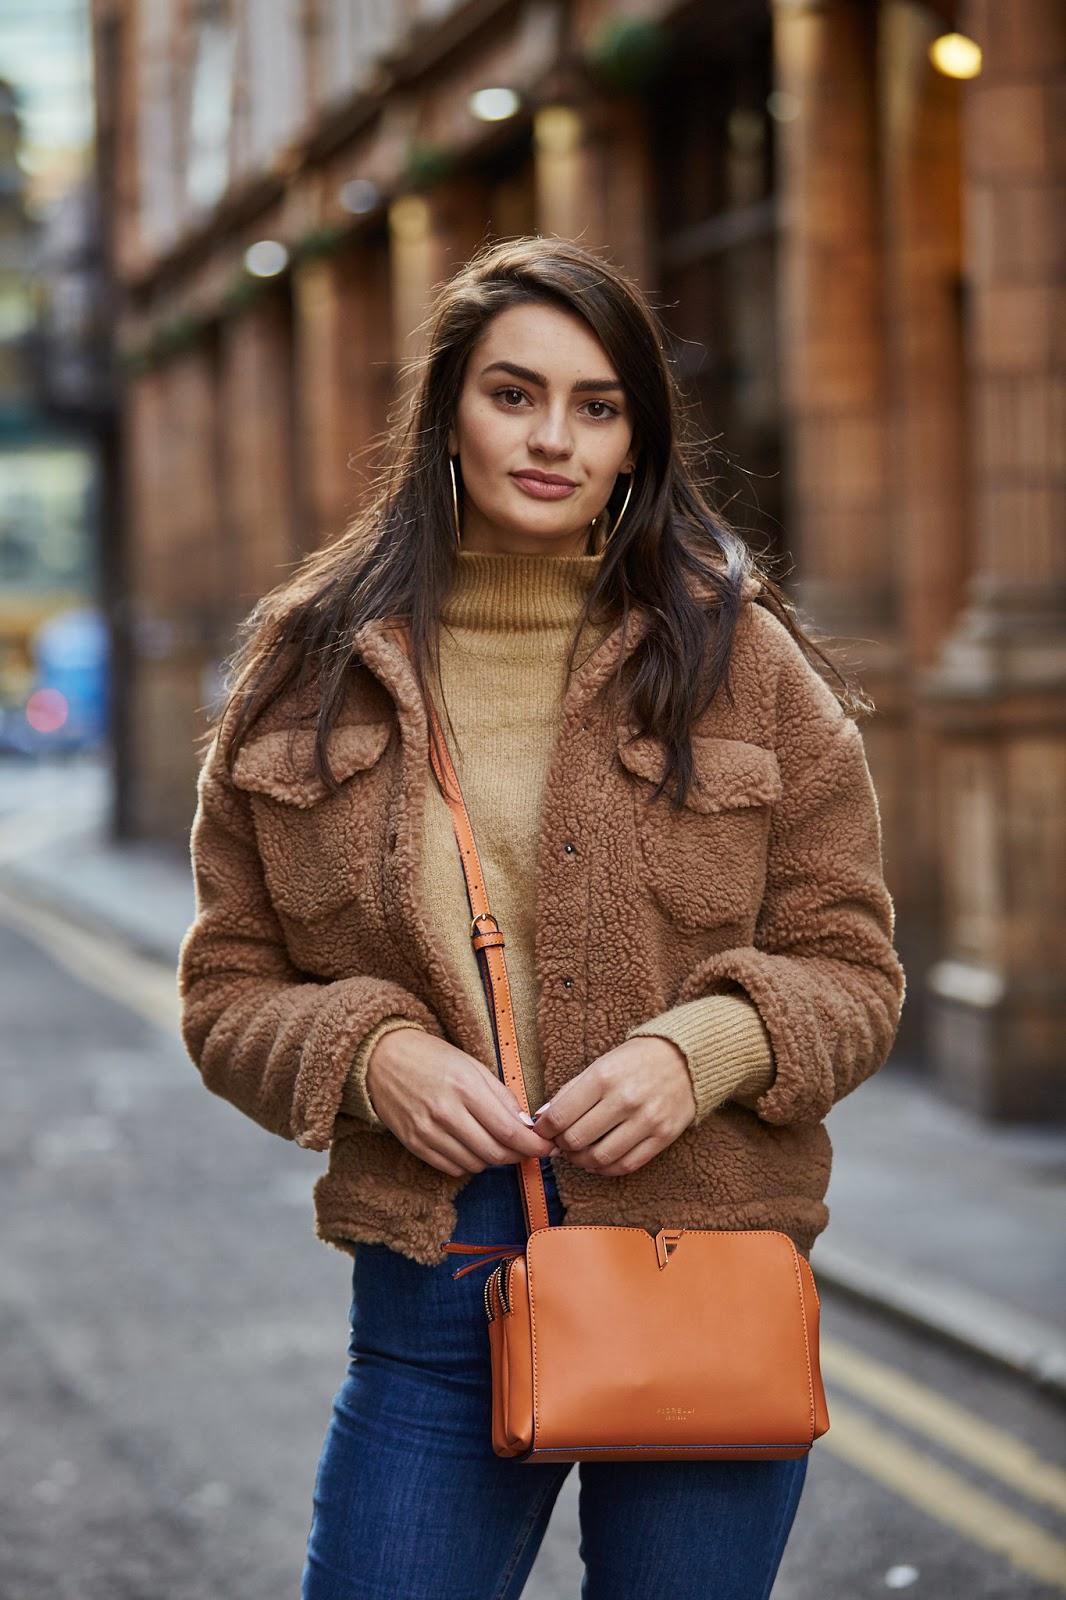 peexo blogger lfw street style